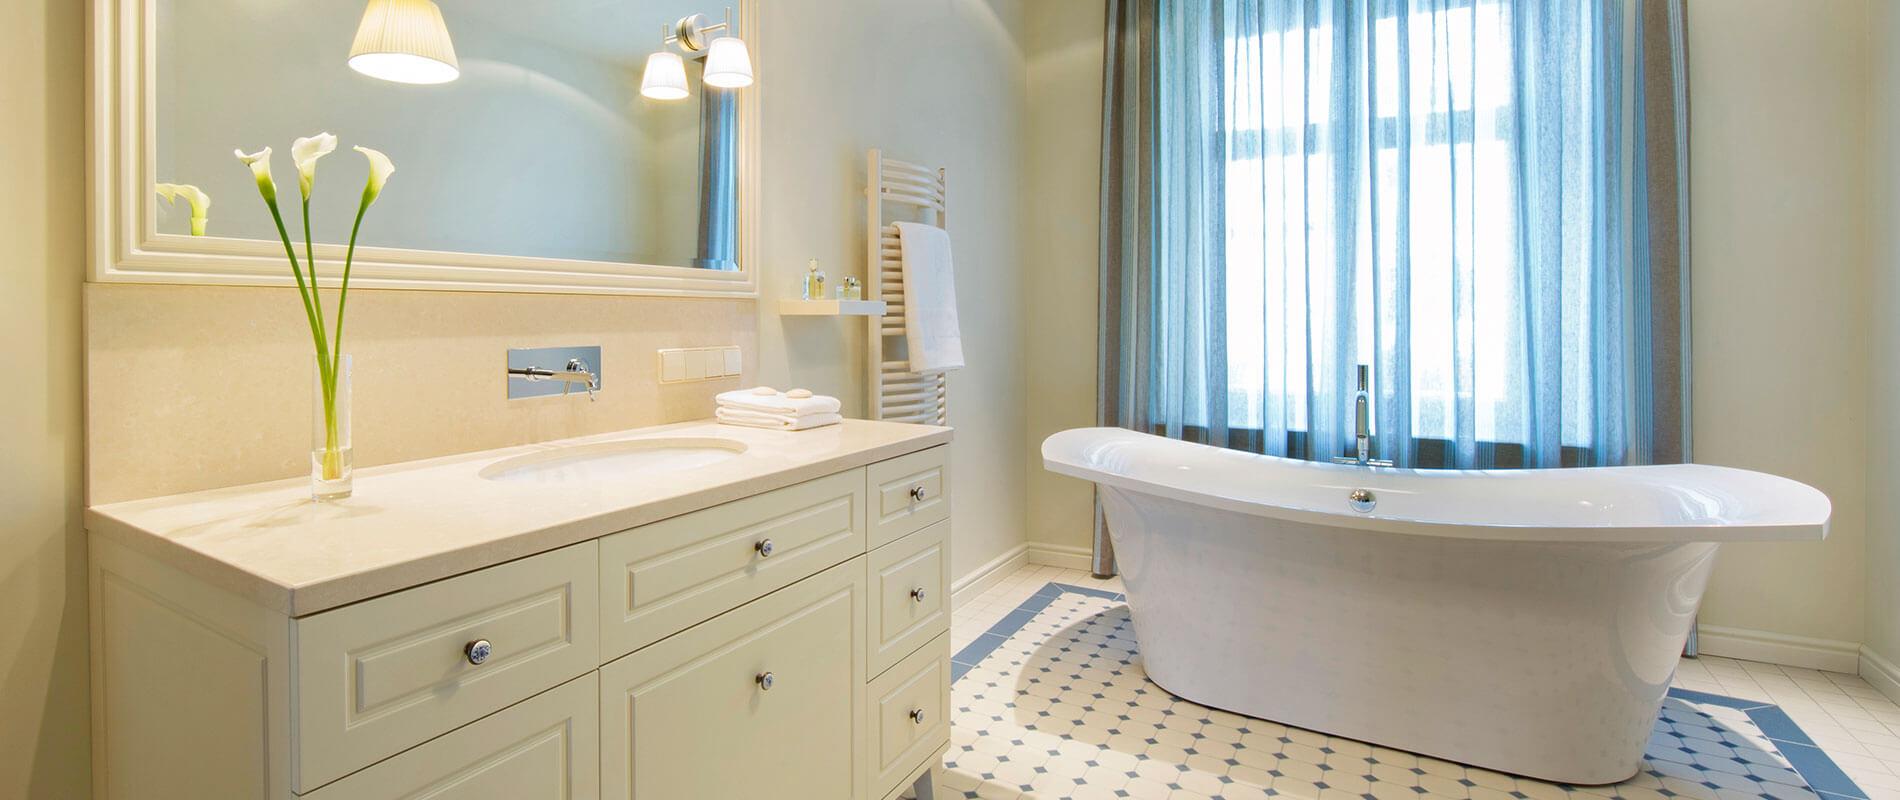 Craftsmen Home Improvements Inc Cincinnati OH Bath Remodel - Bathroom fixtures cincinnati